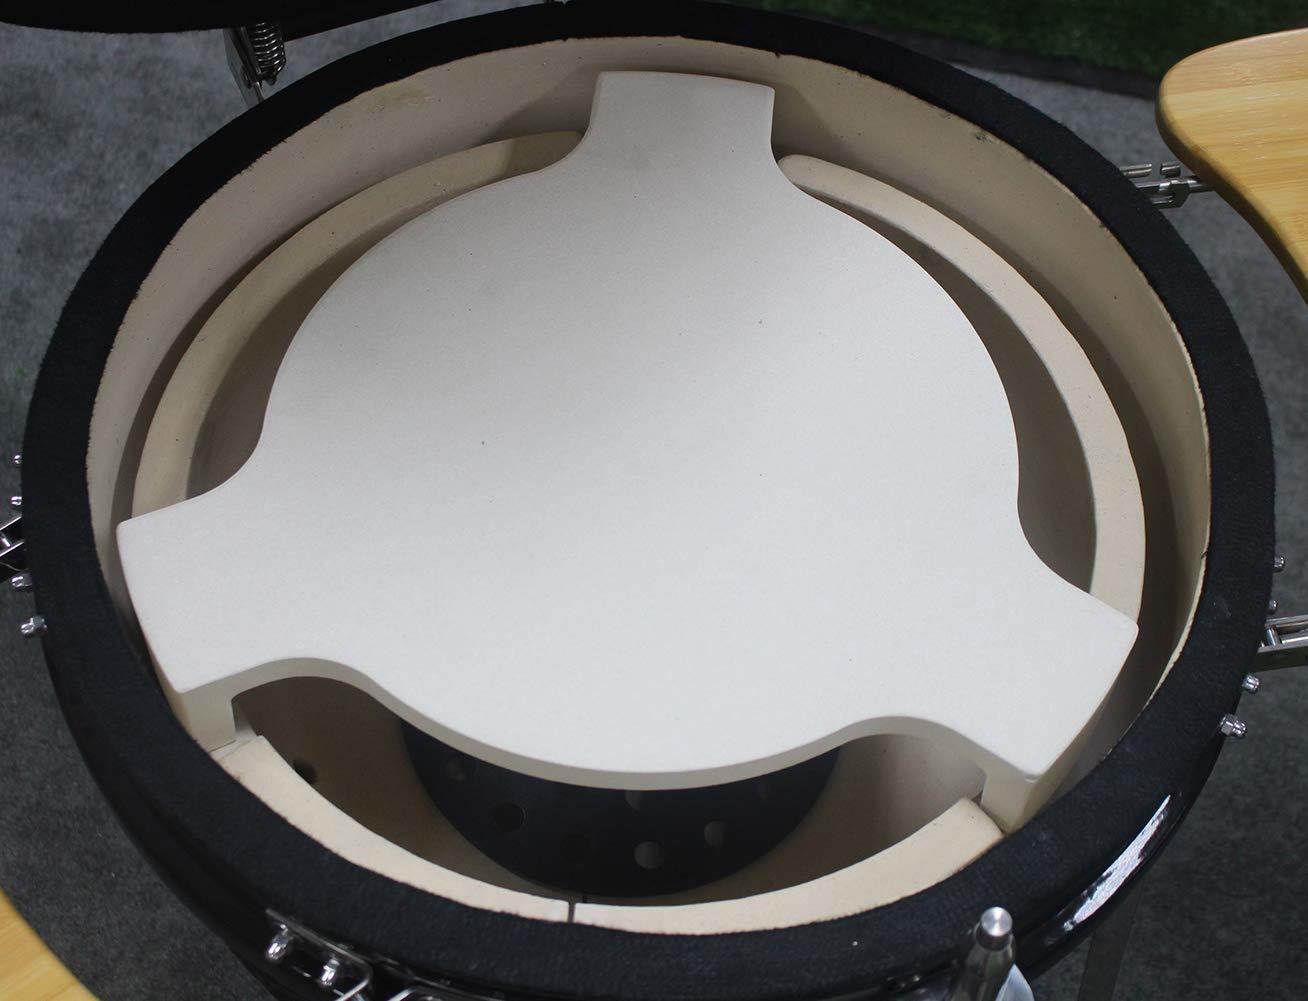 "Heat Deflector for Gorilla Kamado BBQ Grill 18"" image"